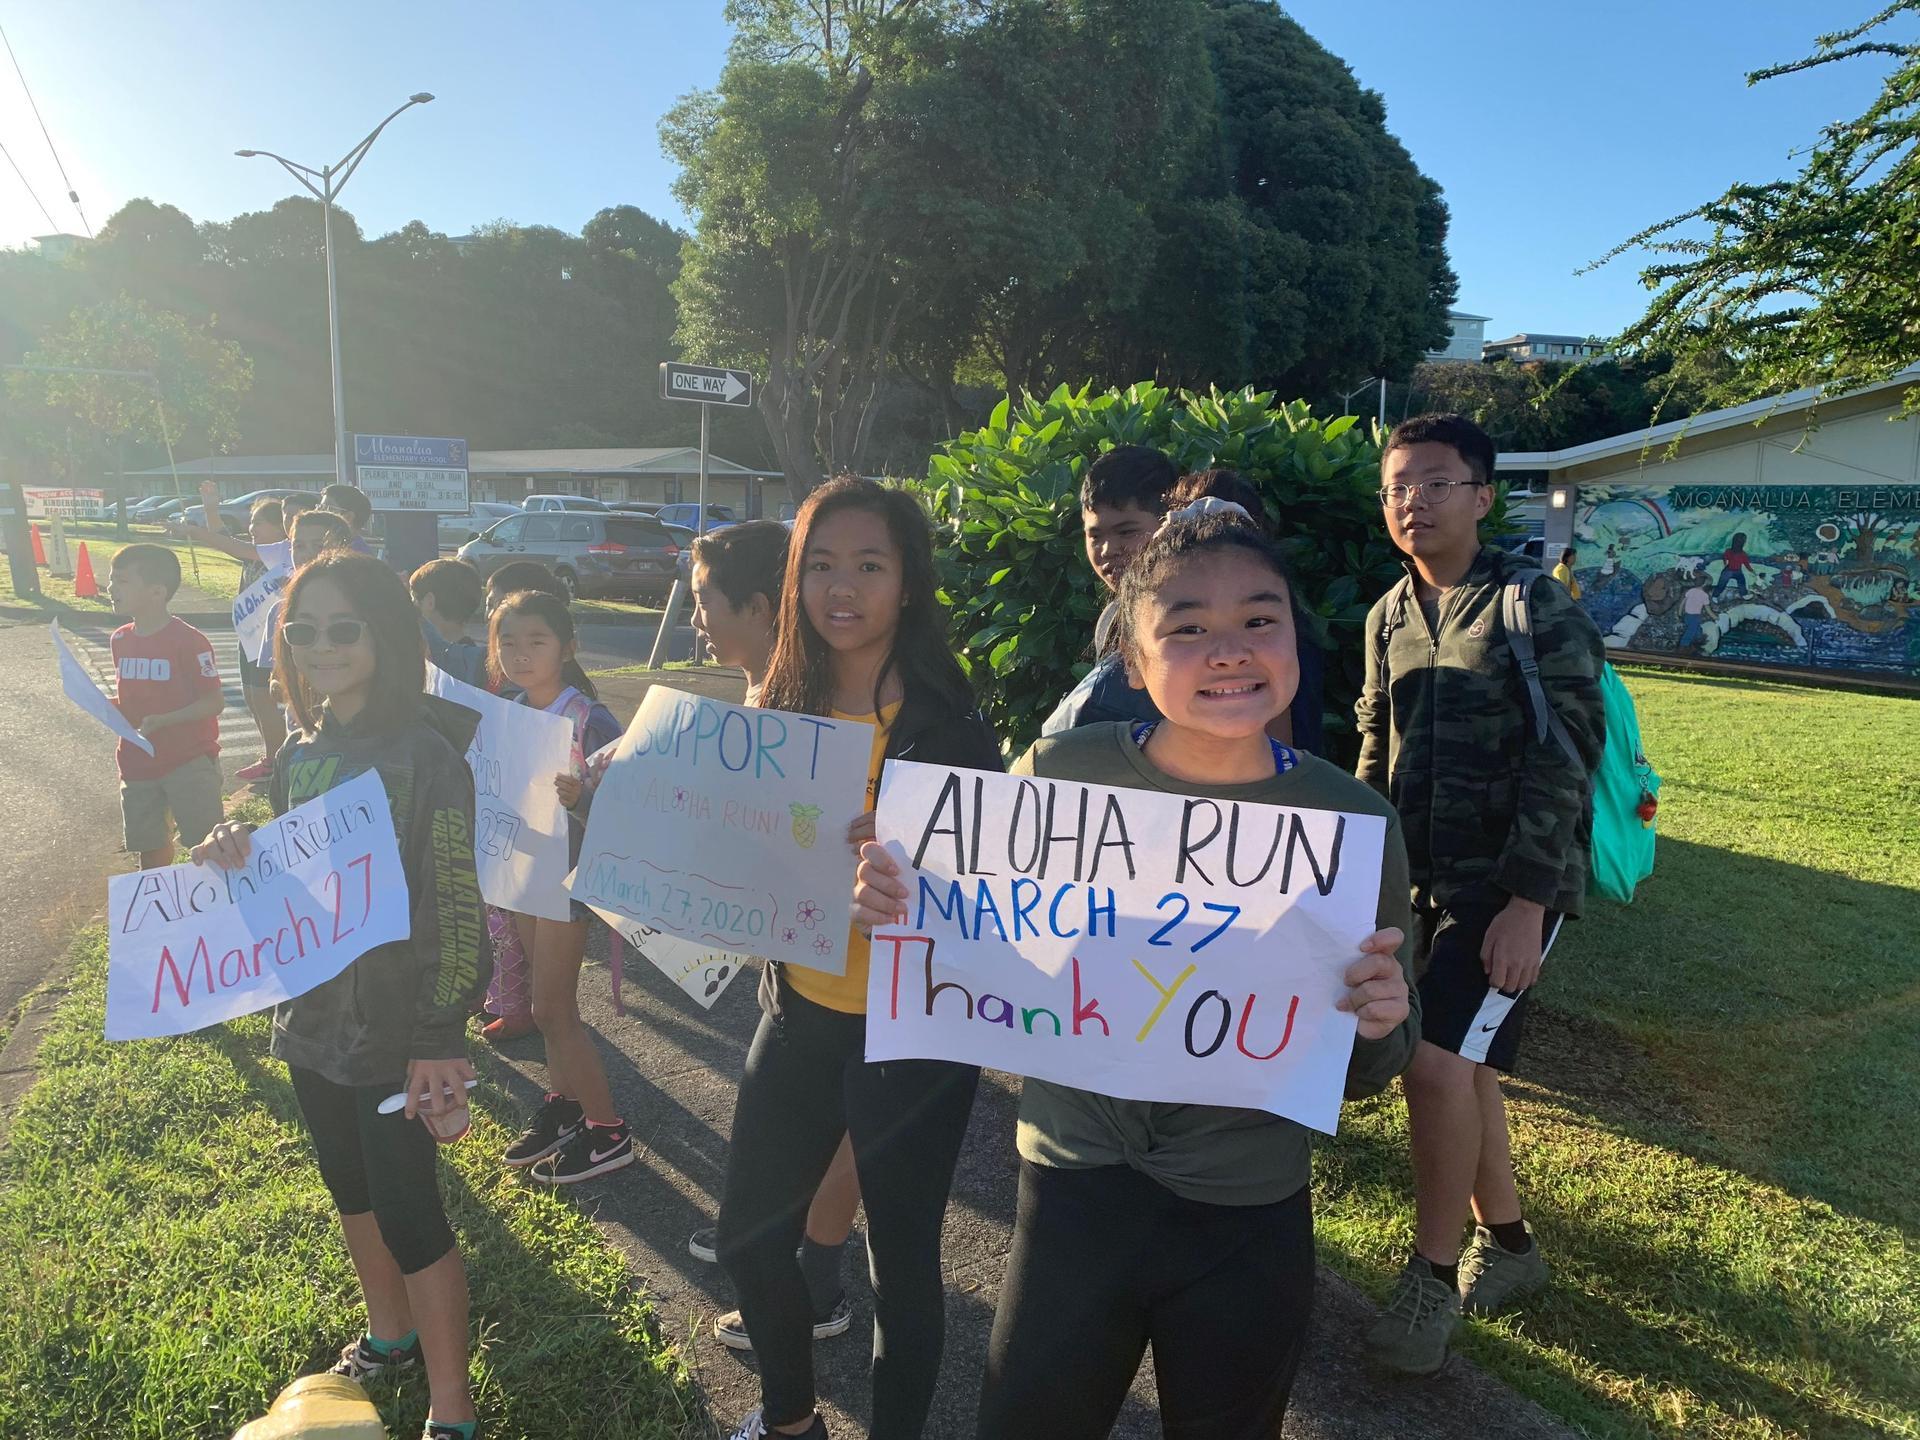 MES Aloha Run sign waving